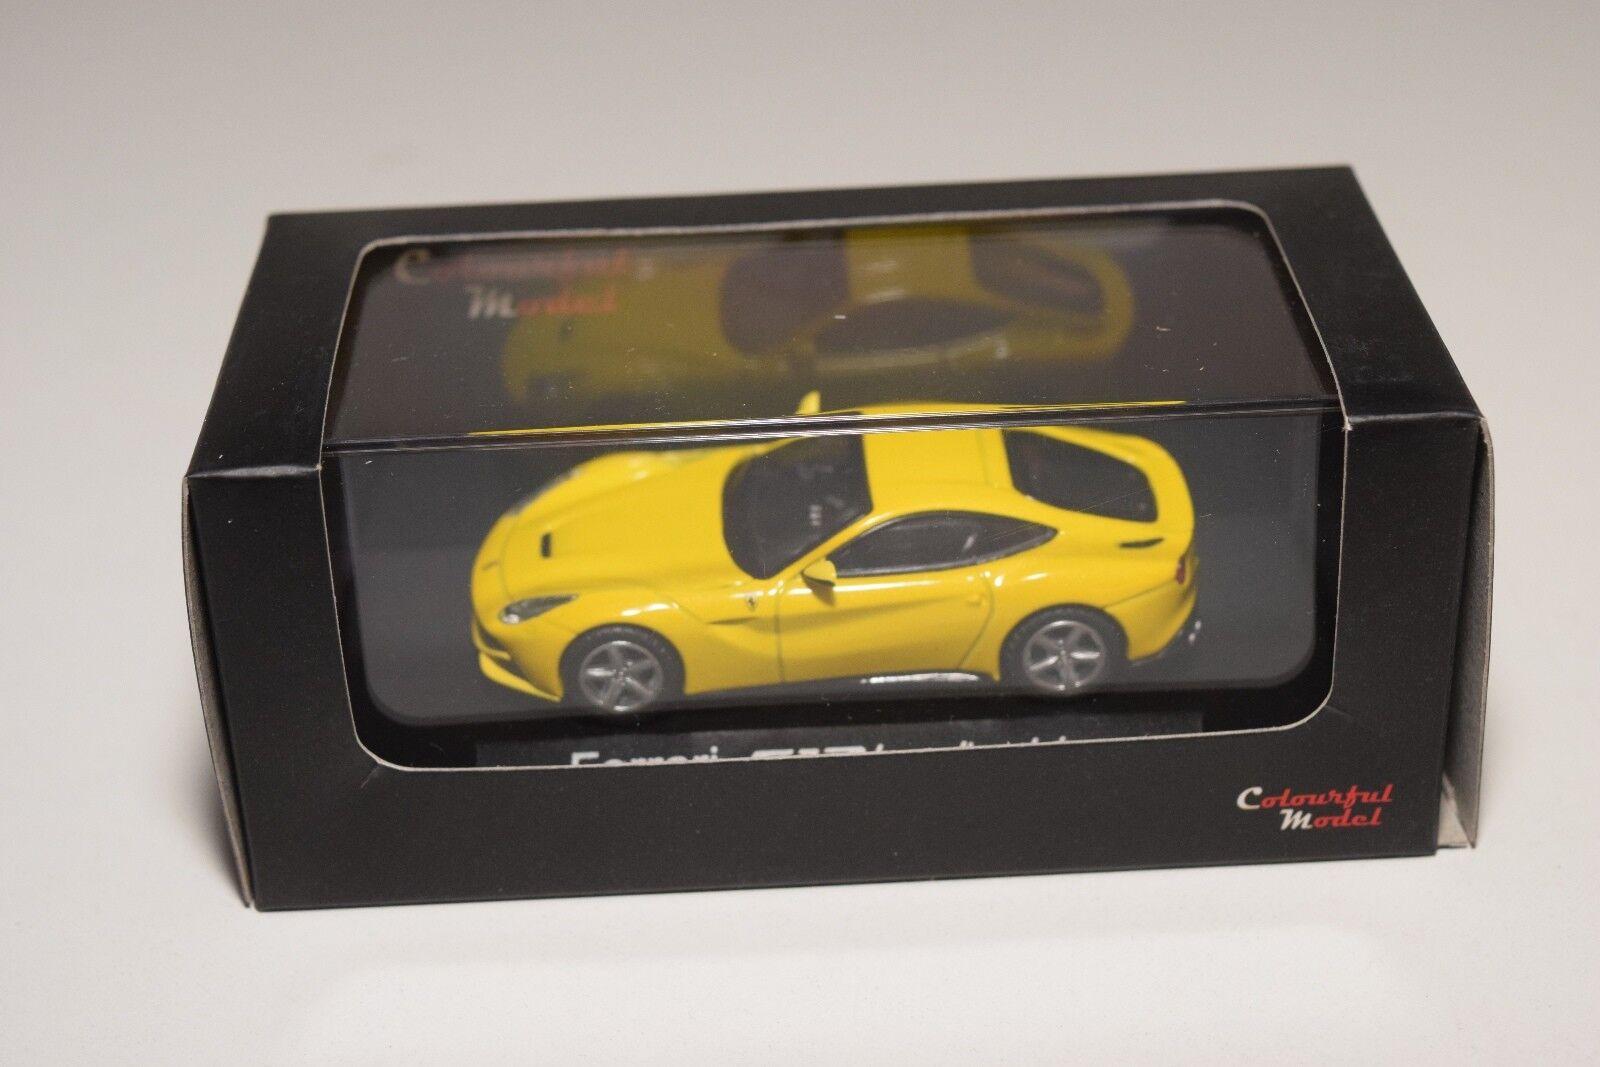 V 1 64 KYOSHO COLOURFUL MODEL CM FERRARI F12 BERLINETTA giallo MINT BOXED